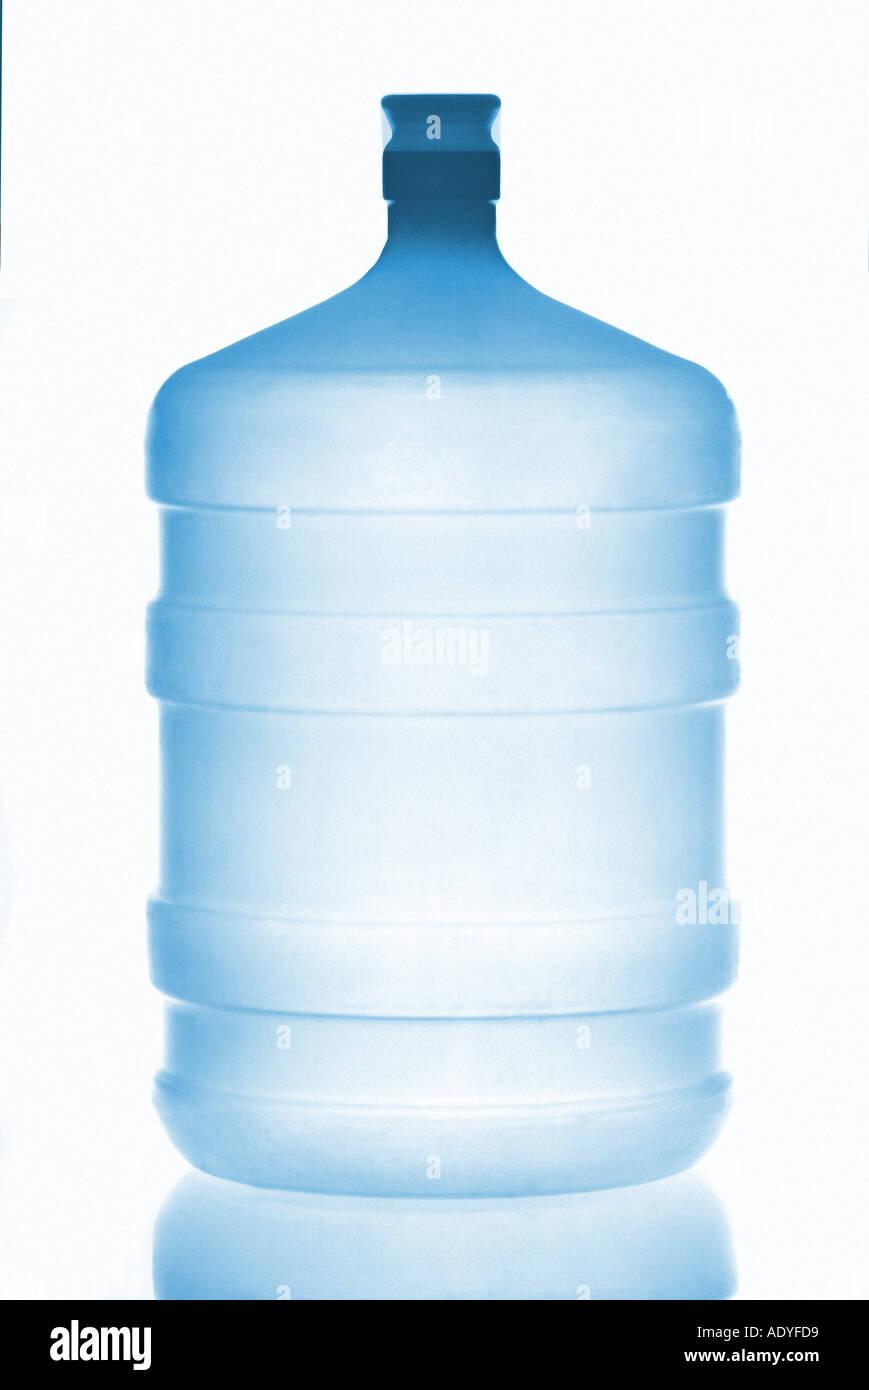 Liquid II water liquid blue splash wet aqua transparent clear reflection reflect bottle 20l 5l gallon - Stock Image